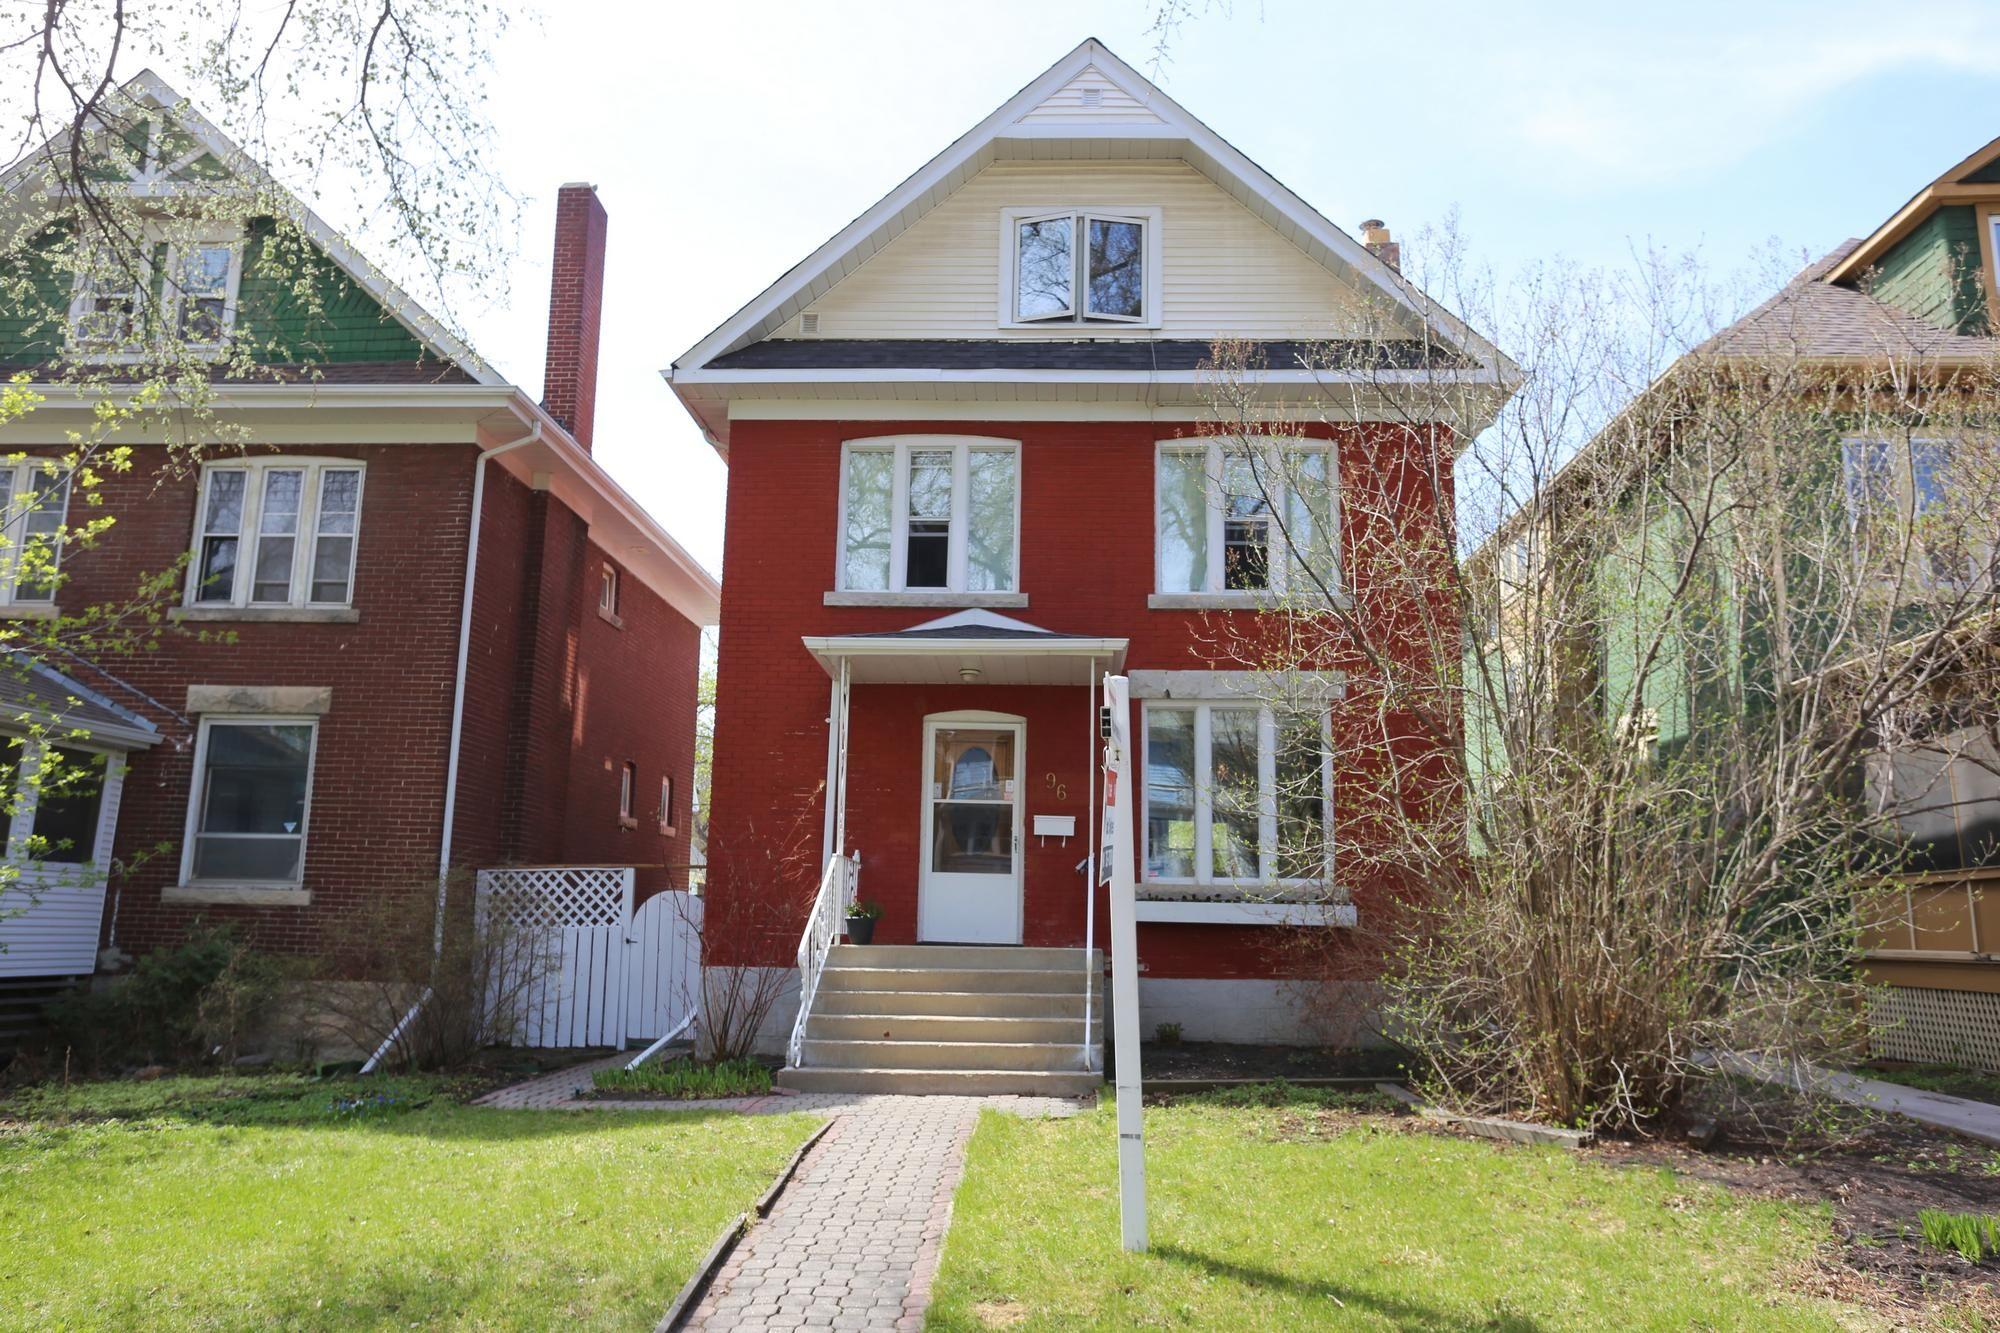 Photo 37: Photos: 96 Home Street in Winnipeg: Wolseley Single Family Detached for sale (5B)  : MLS®# 1810985